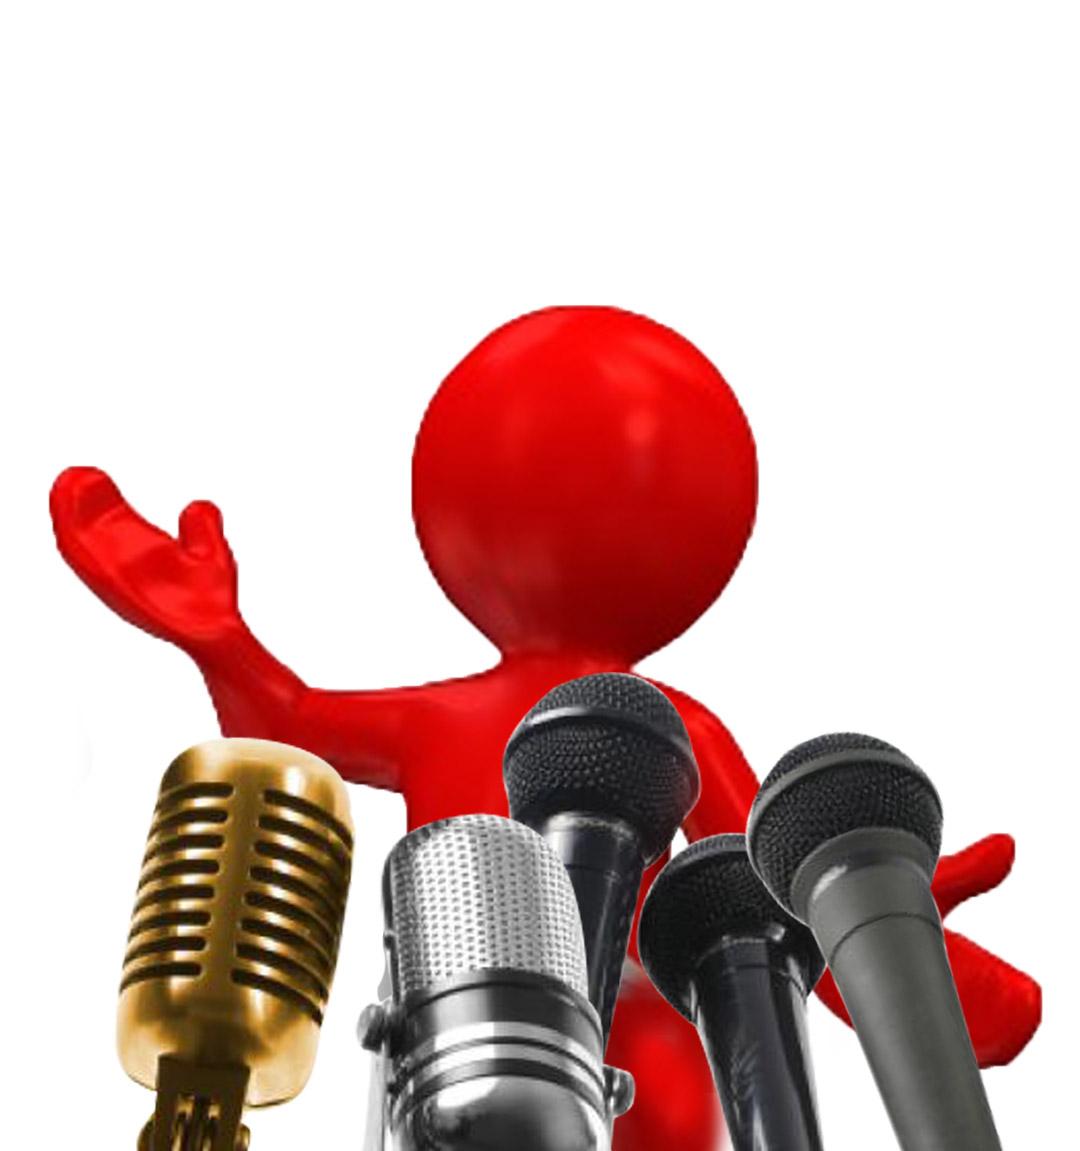 Public Speaking Clip Art N25 free image.